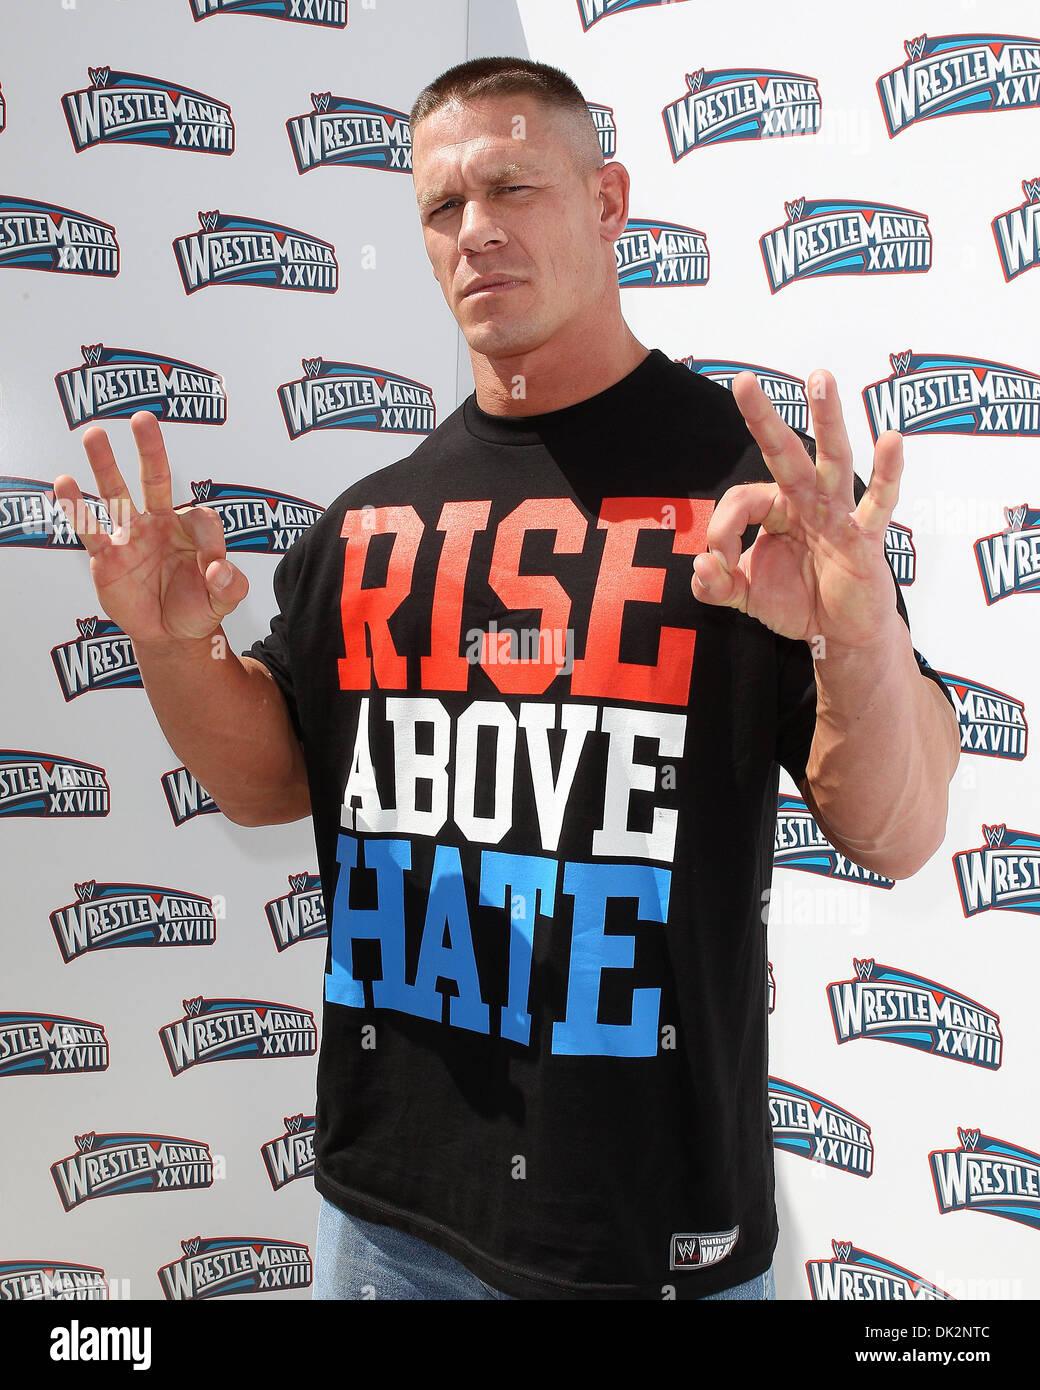 John Cena Pressekonferenz Fur Wrestlemania Xxviii An Eden Roc